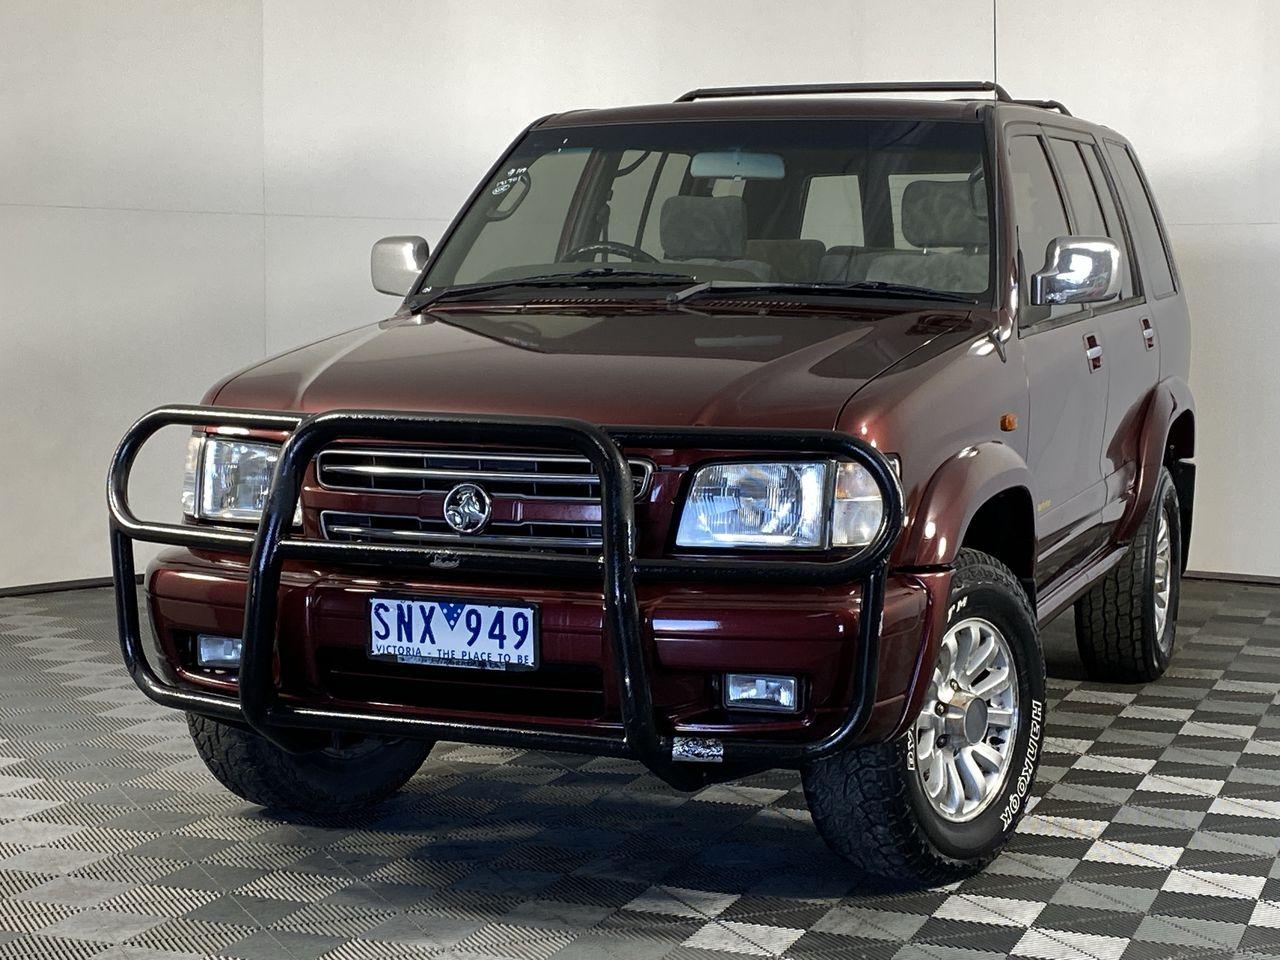 2003 Holden Jackaroo SE LWB (4x4) Automatic 7 Seats Wagon